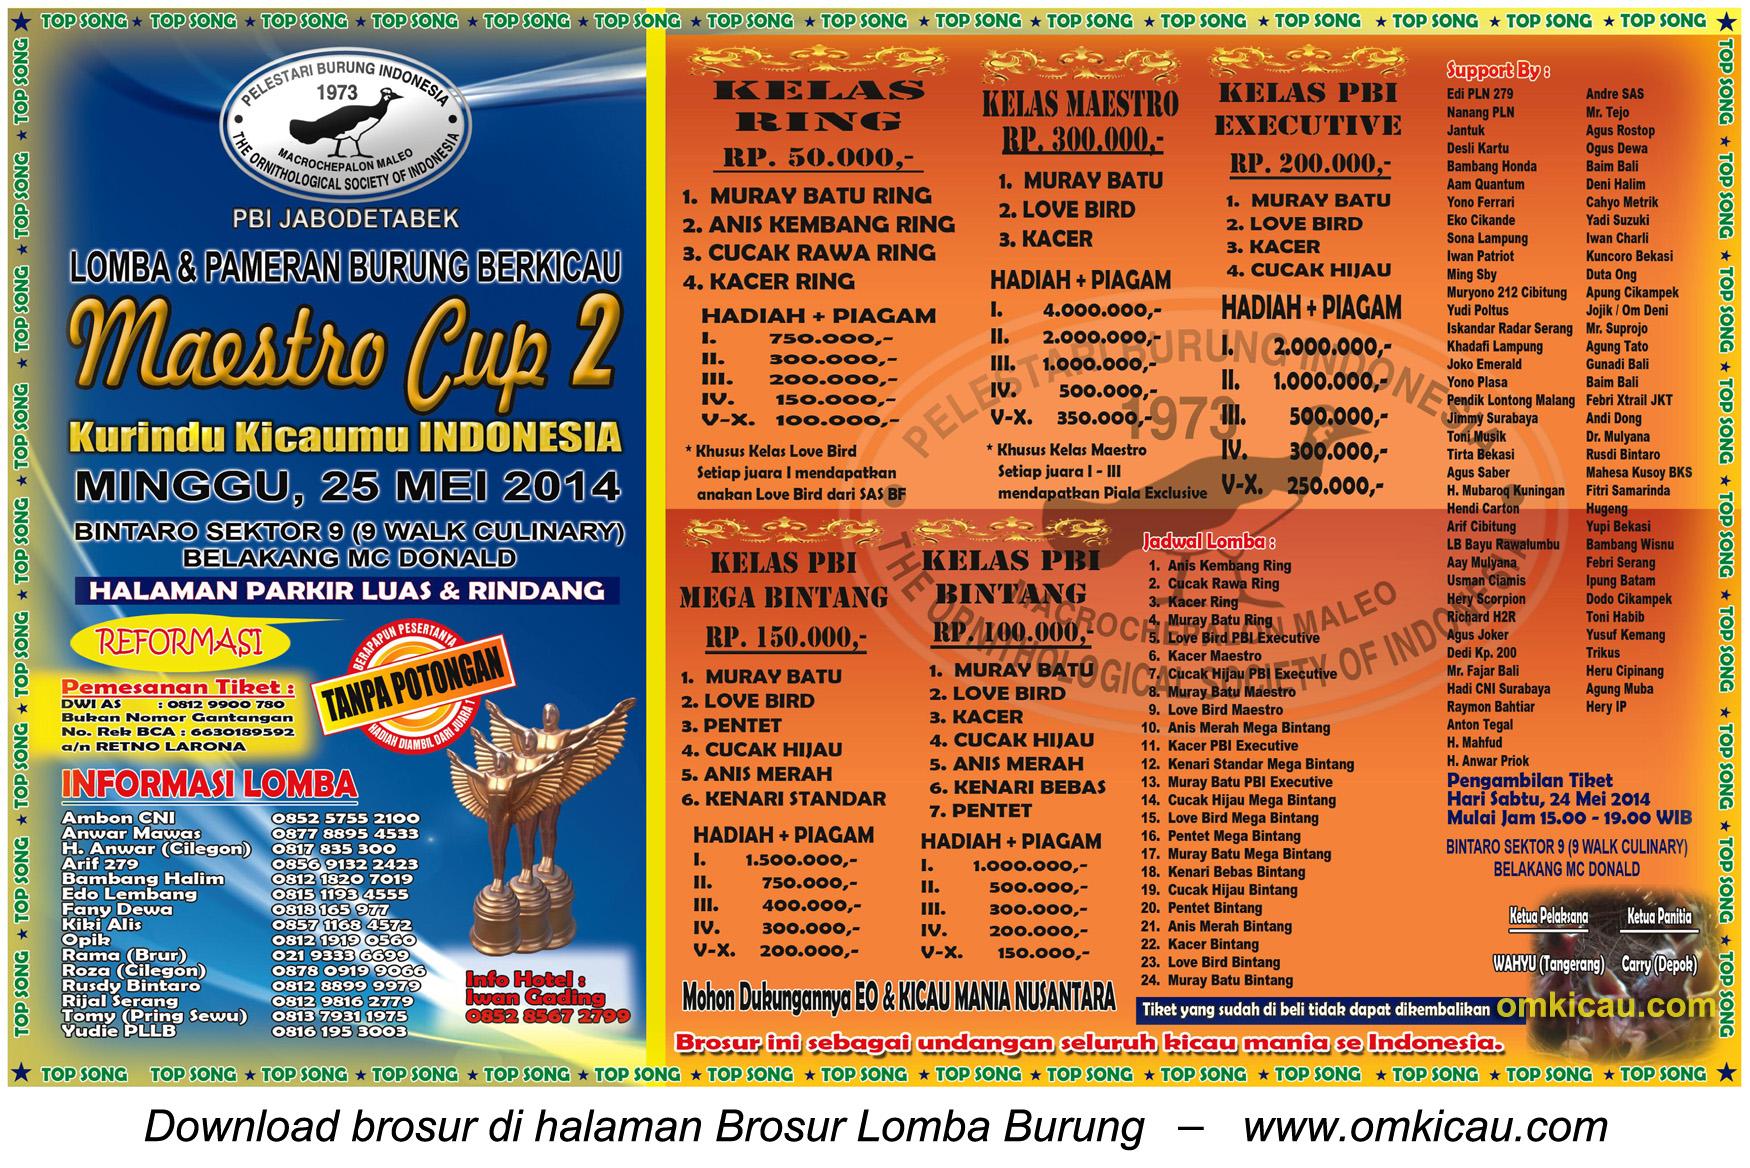 Brosur Lomba Burung Berkicau Maestro Cup 2, Tangerang Selatan, 25 Mei 2014